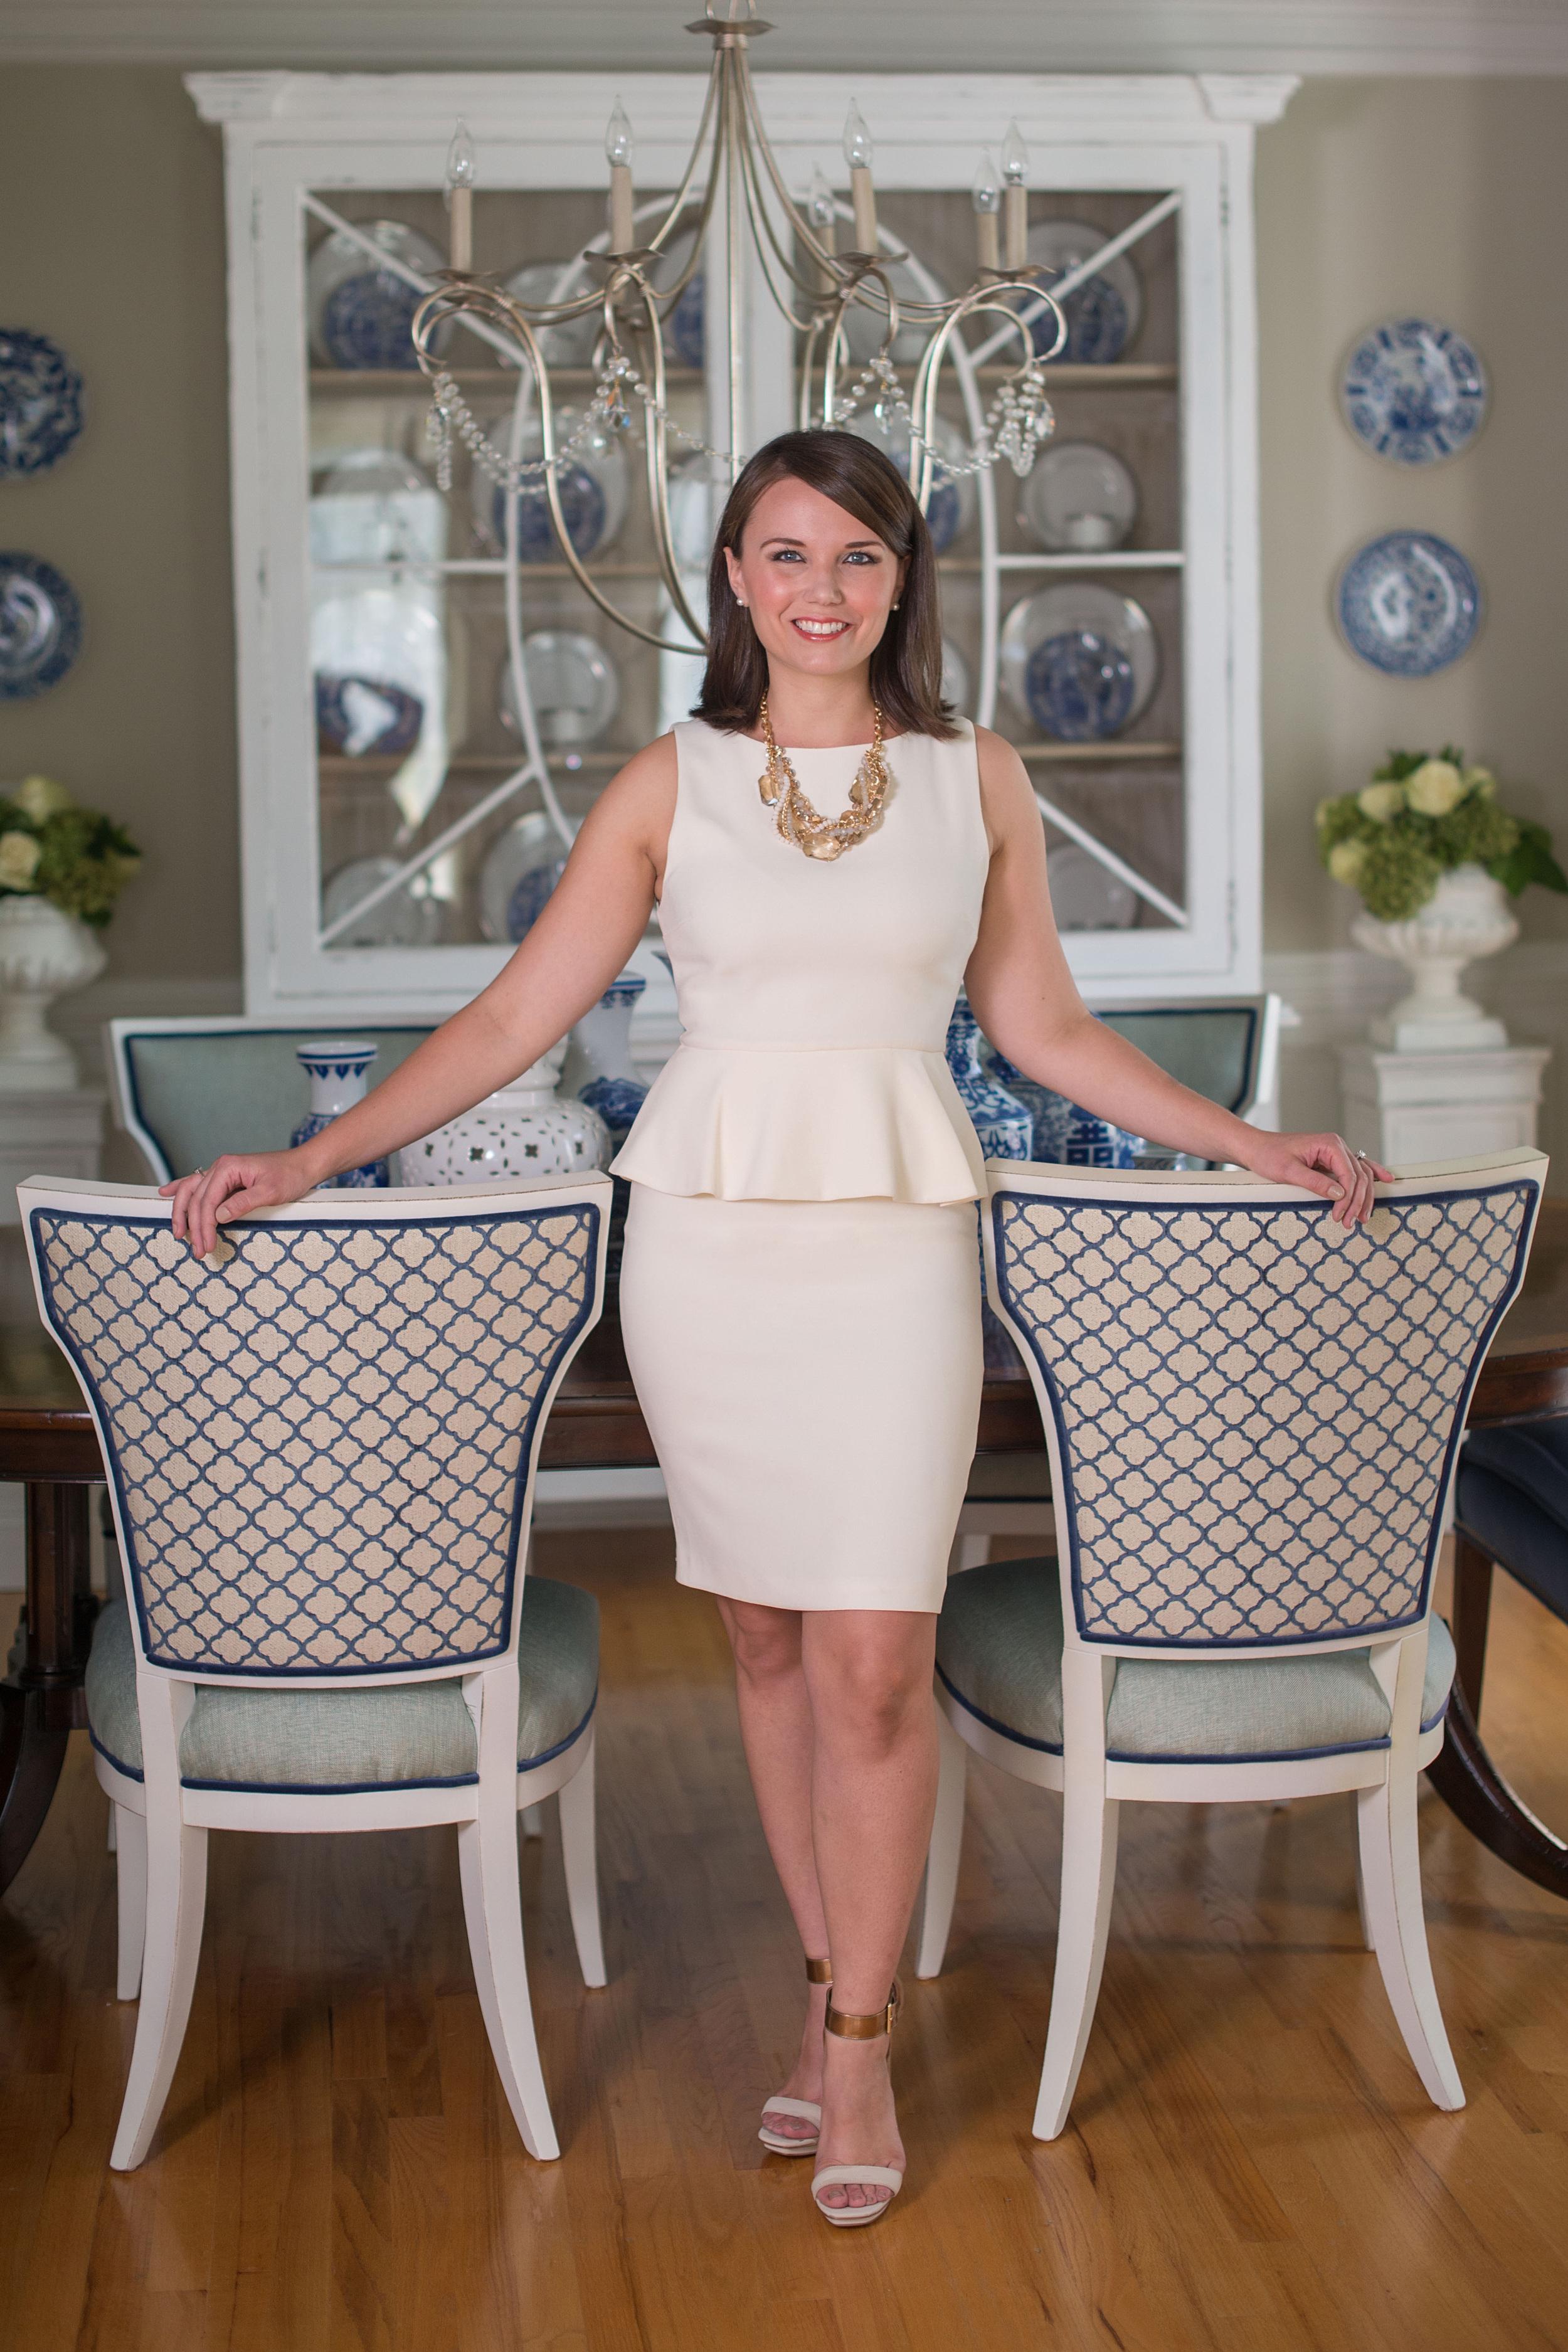 atlanta_luxury_interior_designer_elizabeth_coombs (3).jpg